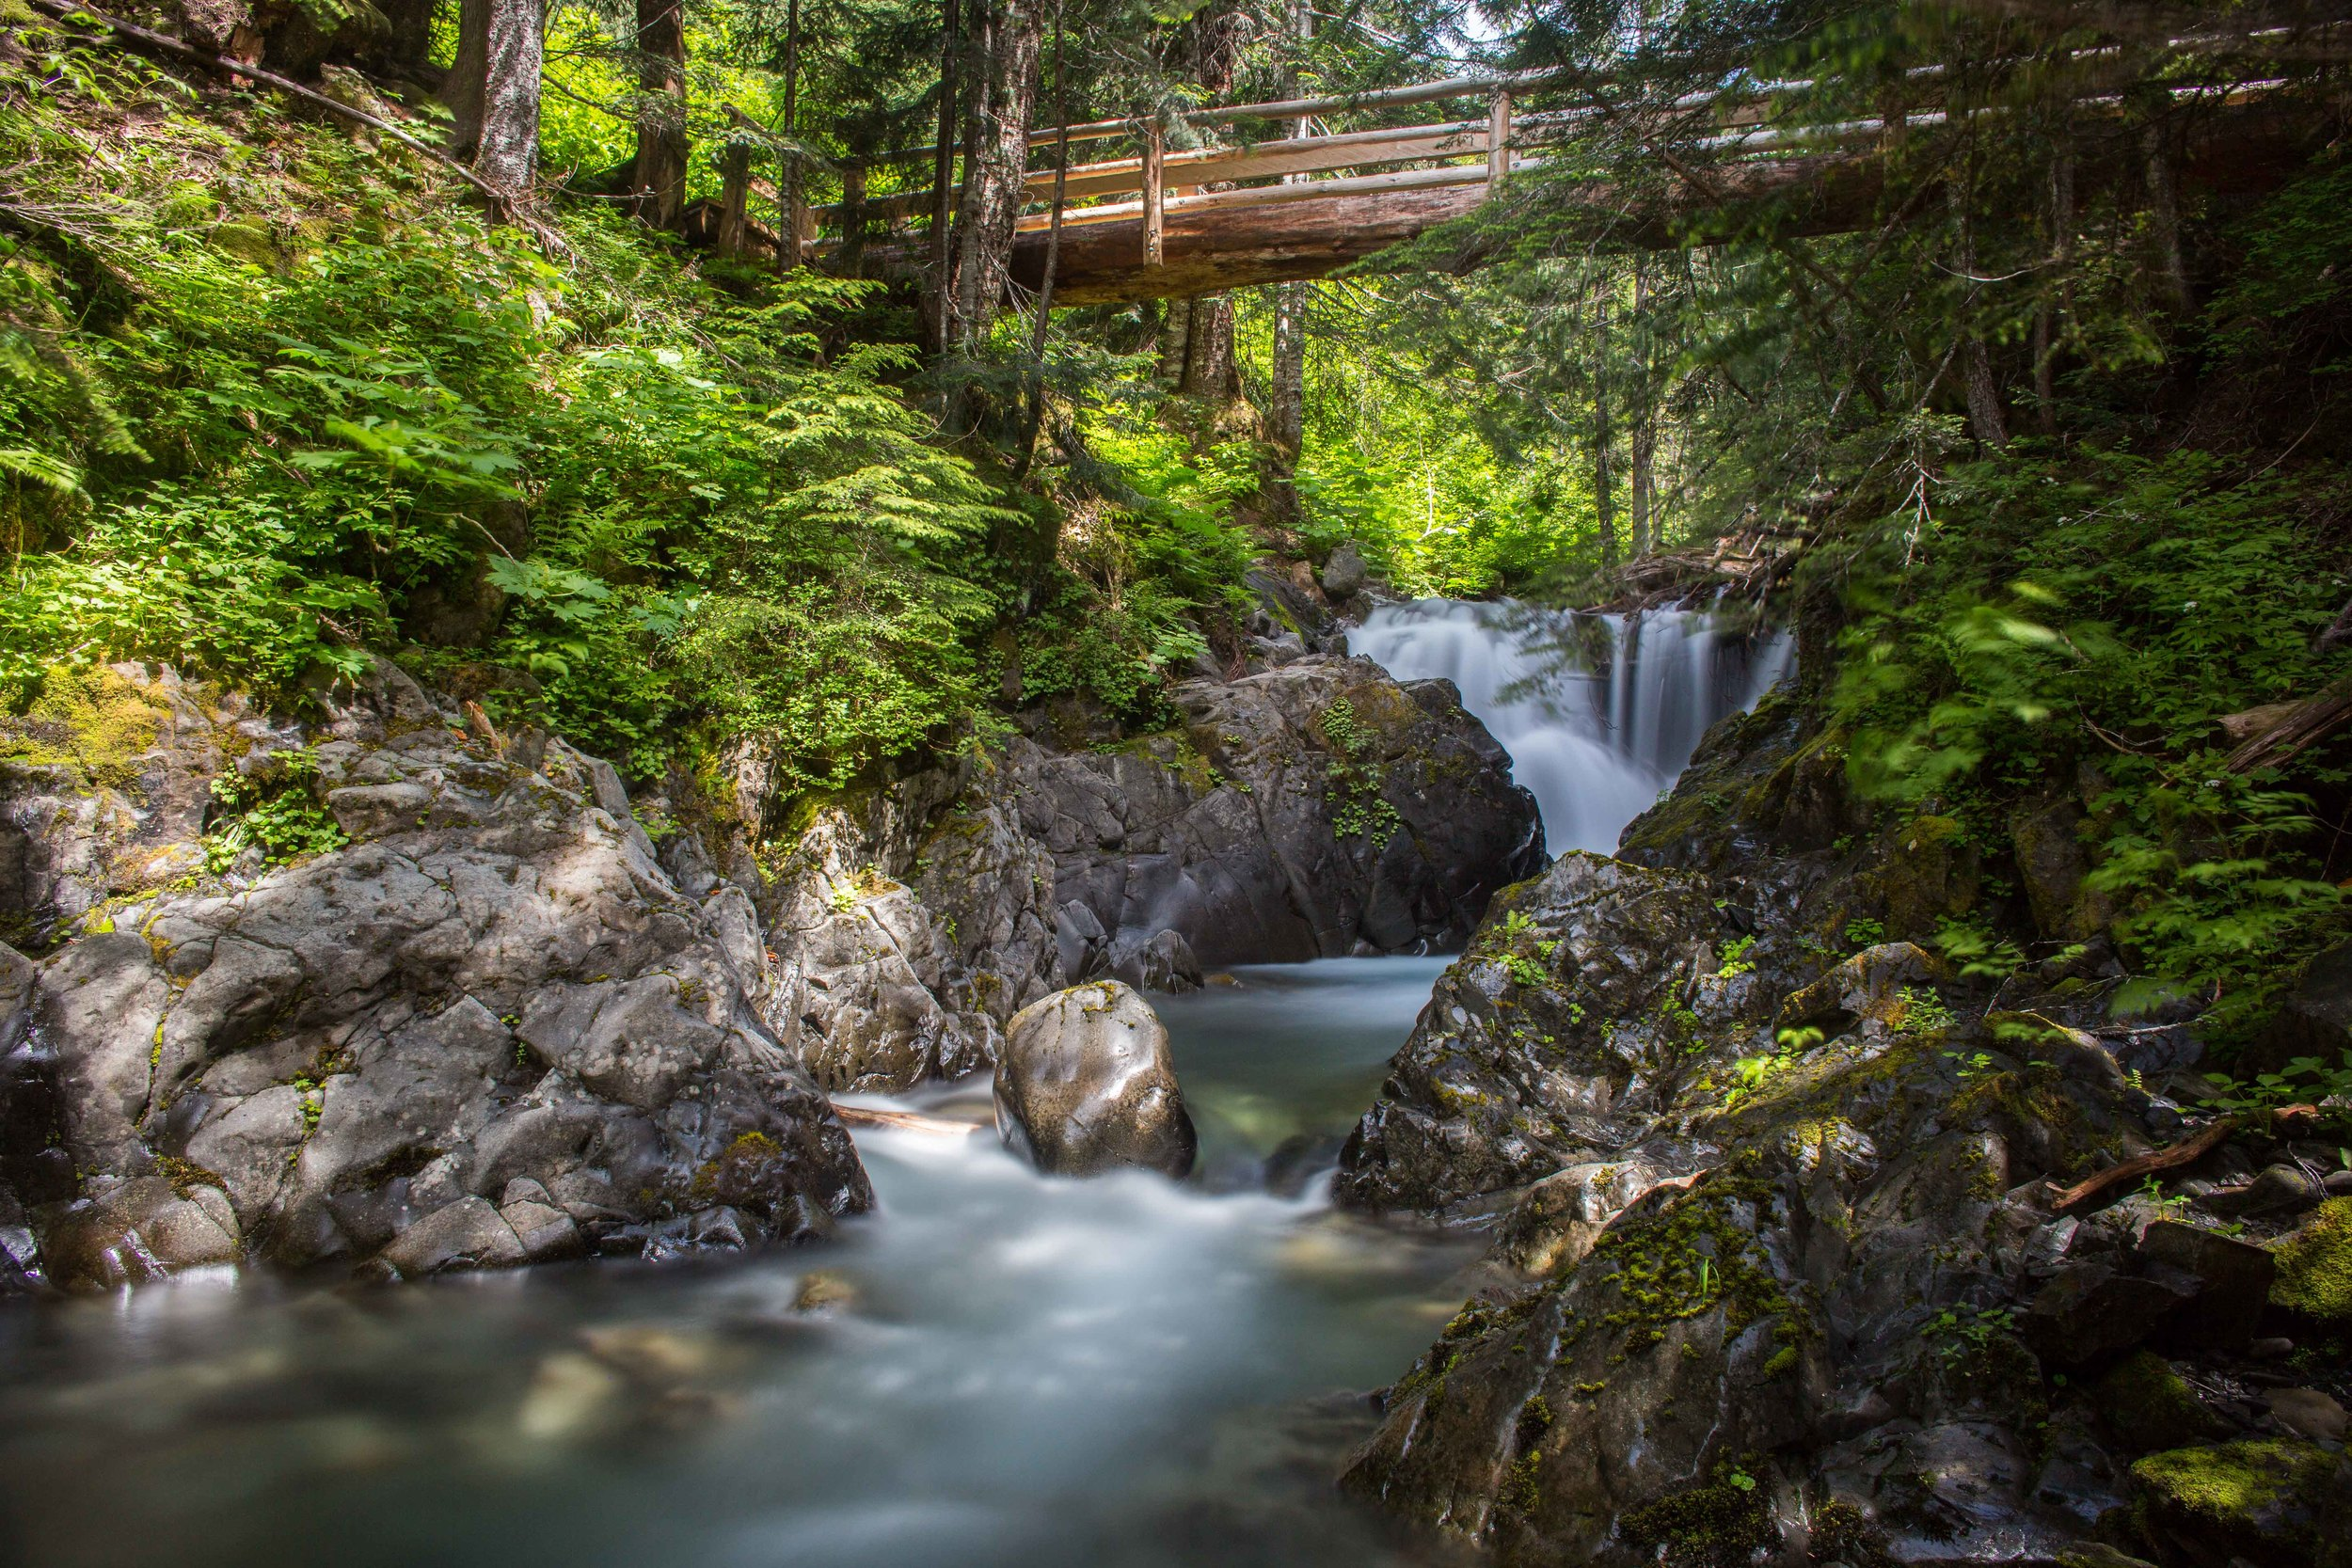 Bridge crossing over a creek